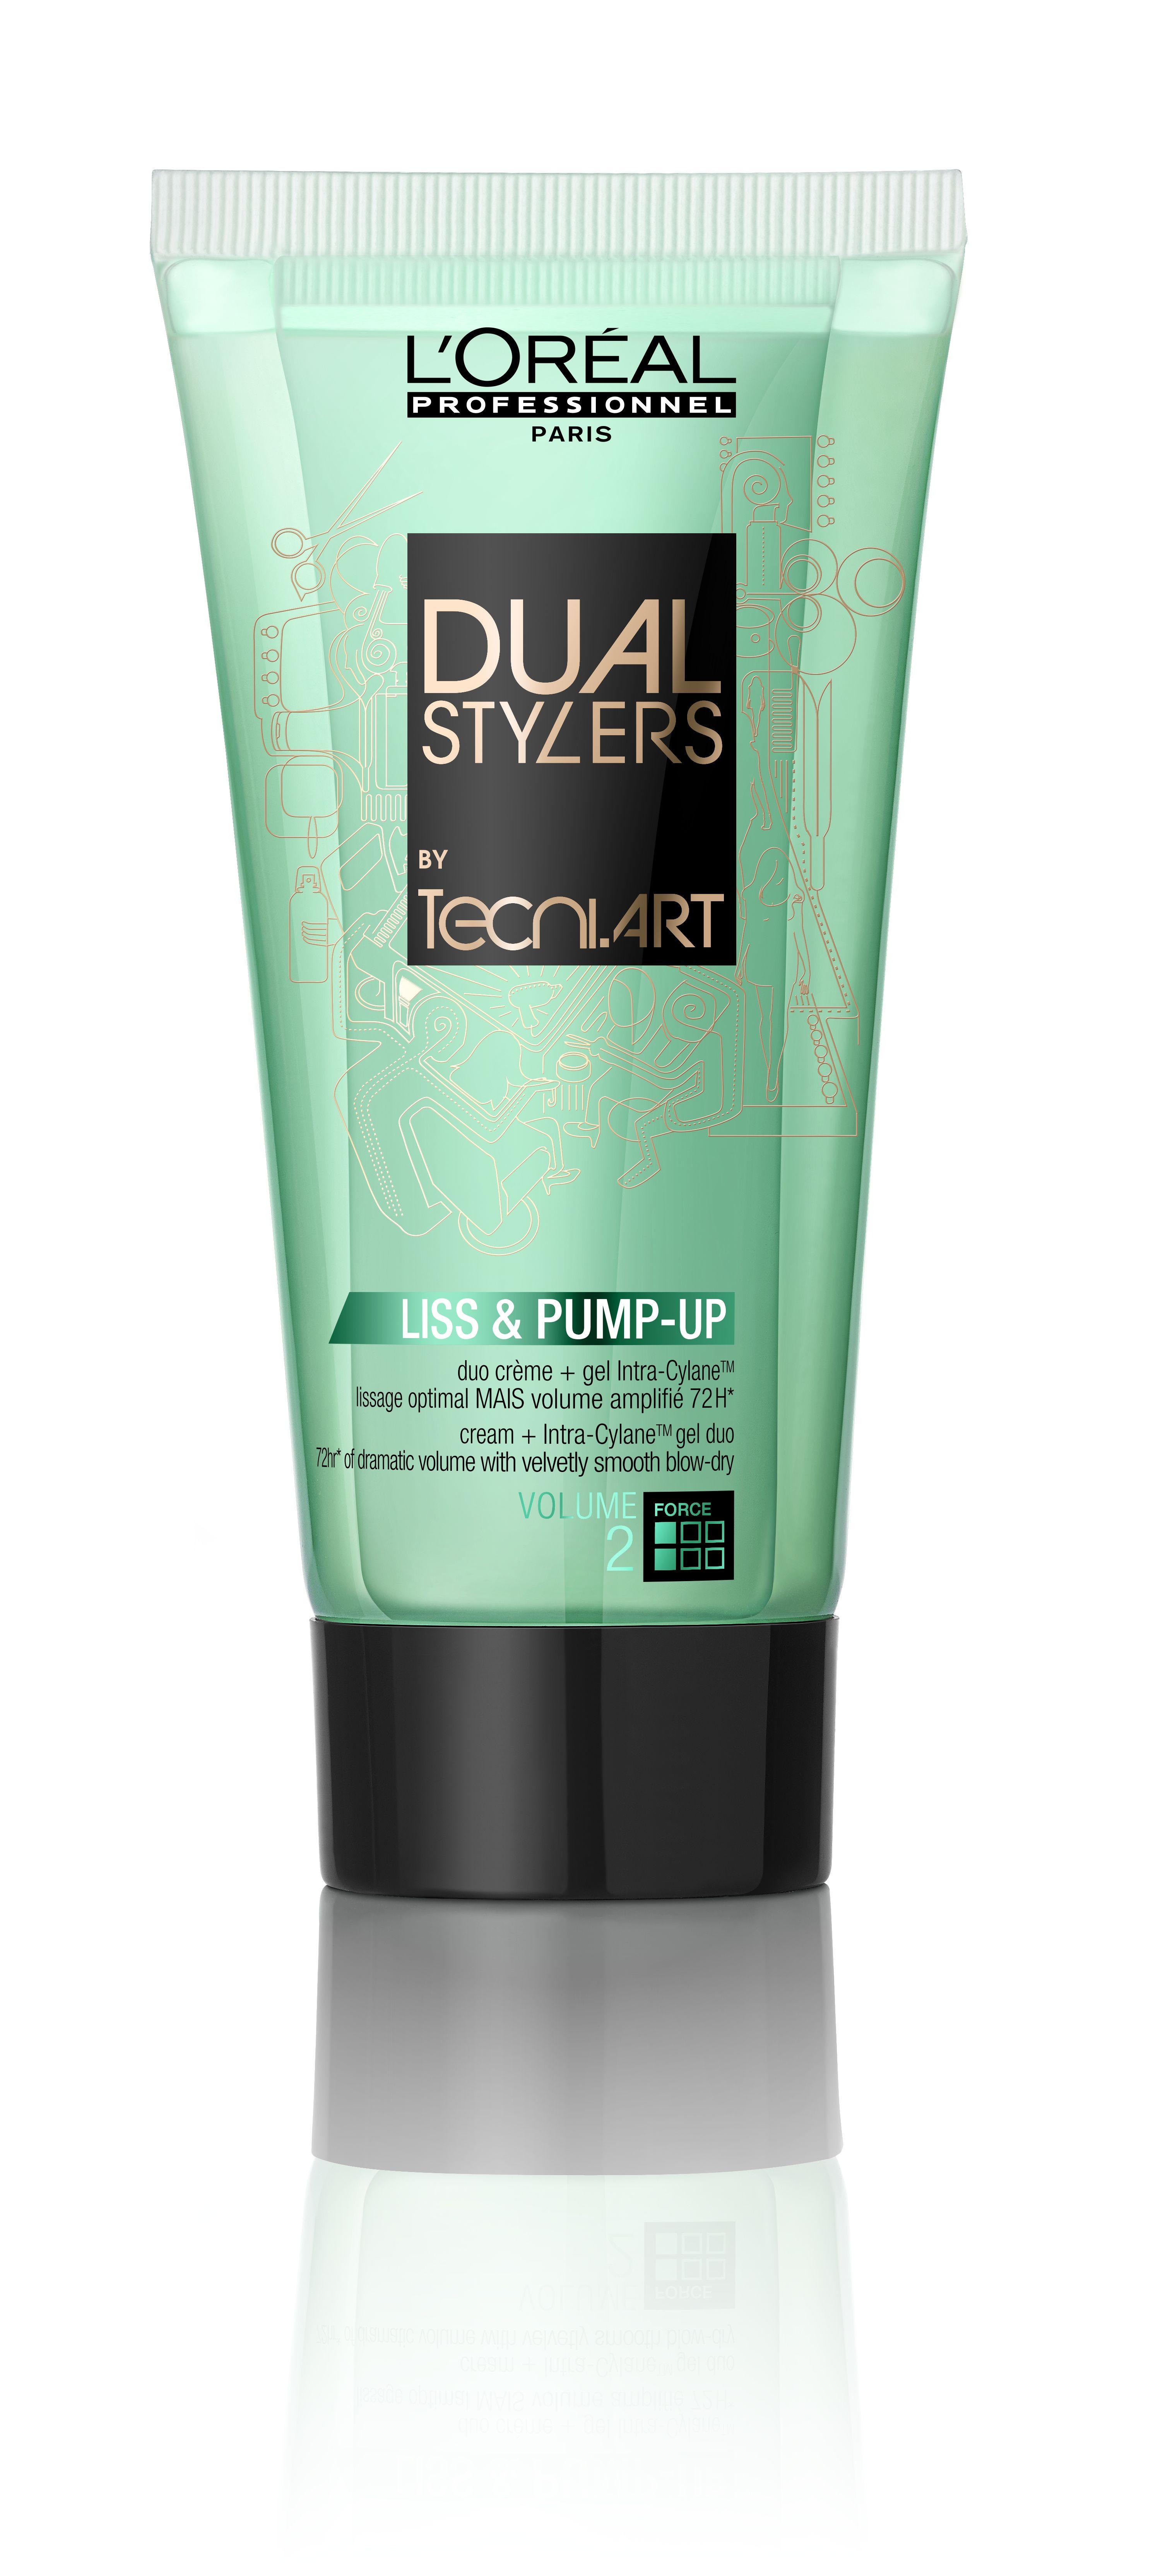 L'Oréal Professionnel Tecni.ART Dual Stylers Liss & Pump-Up 150ml.